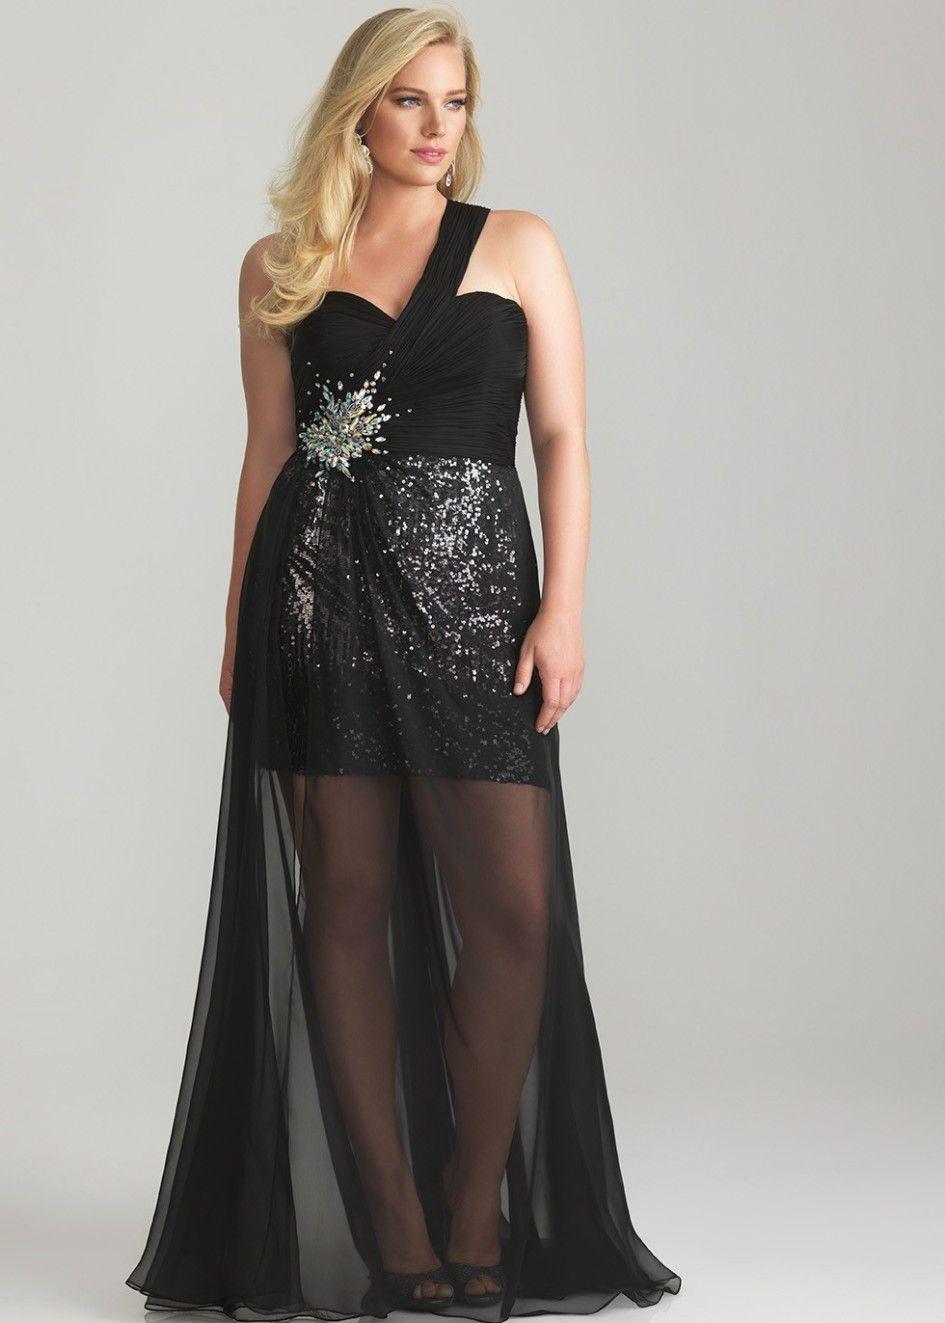 3 4 lace dress dillards   Color dress   Pinterest   Dillards and ...